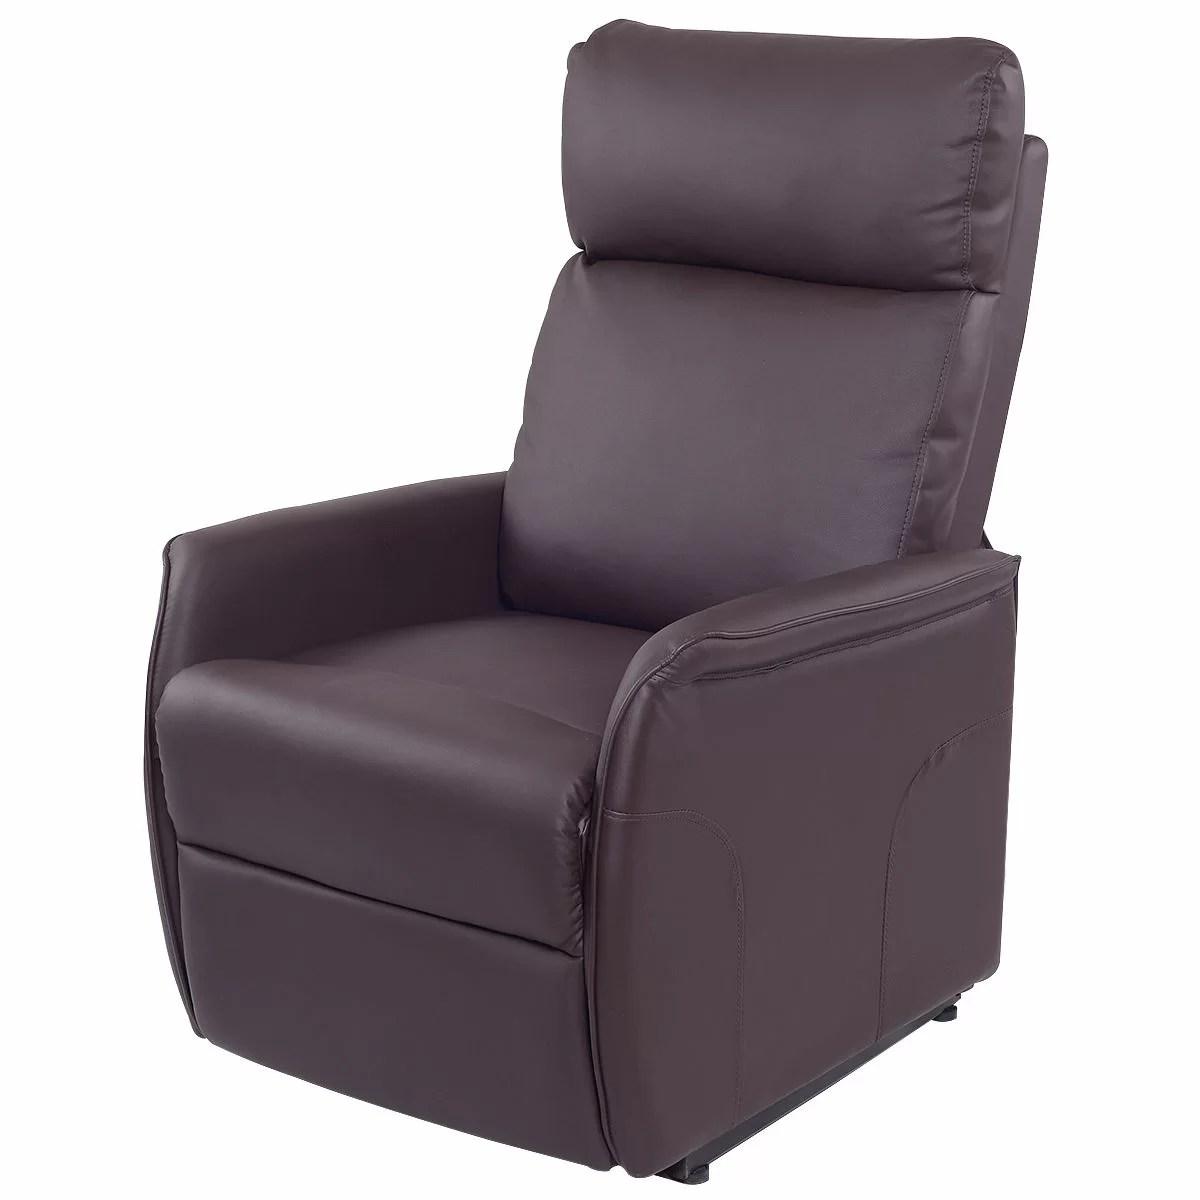 high lift chair jcpenney dining room covers red barrel studio kirsch electric power recliner wayfair